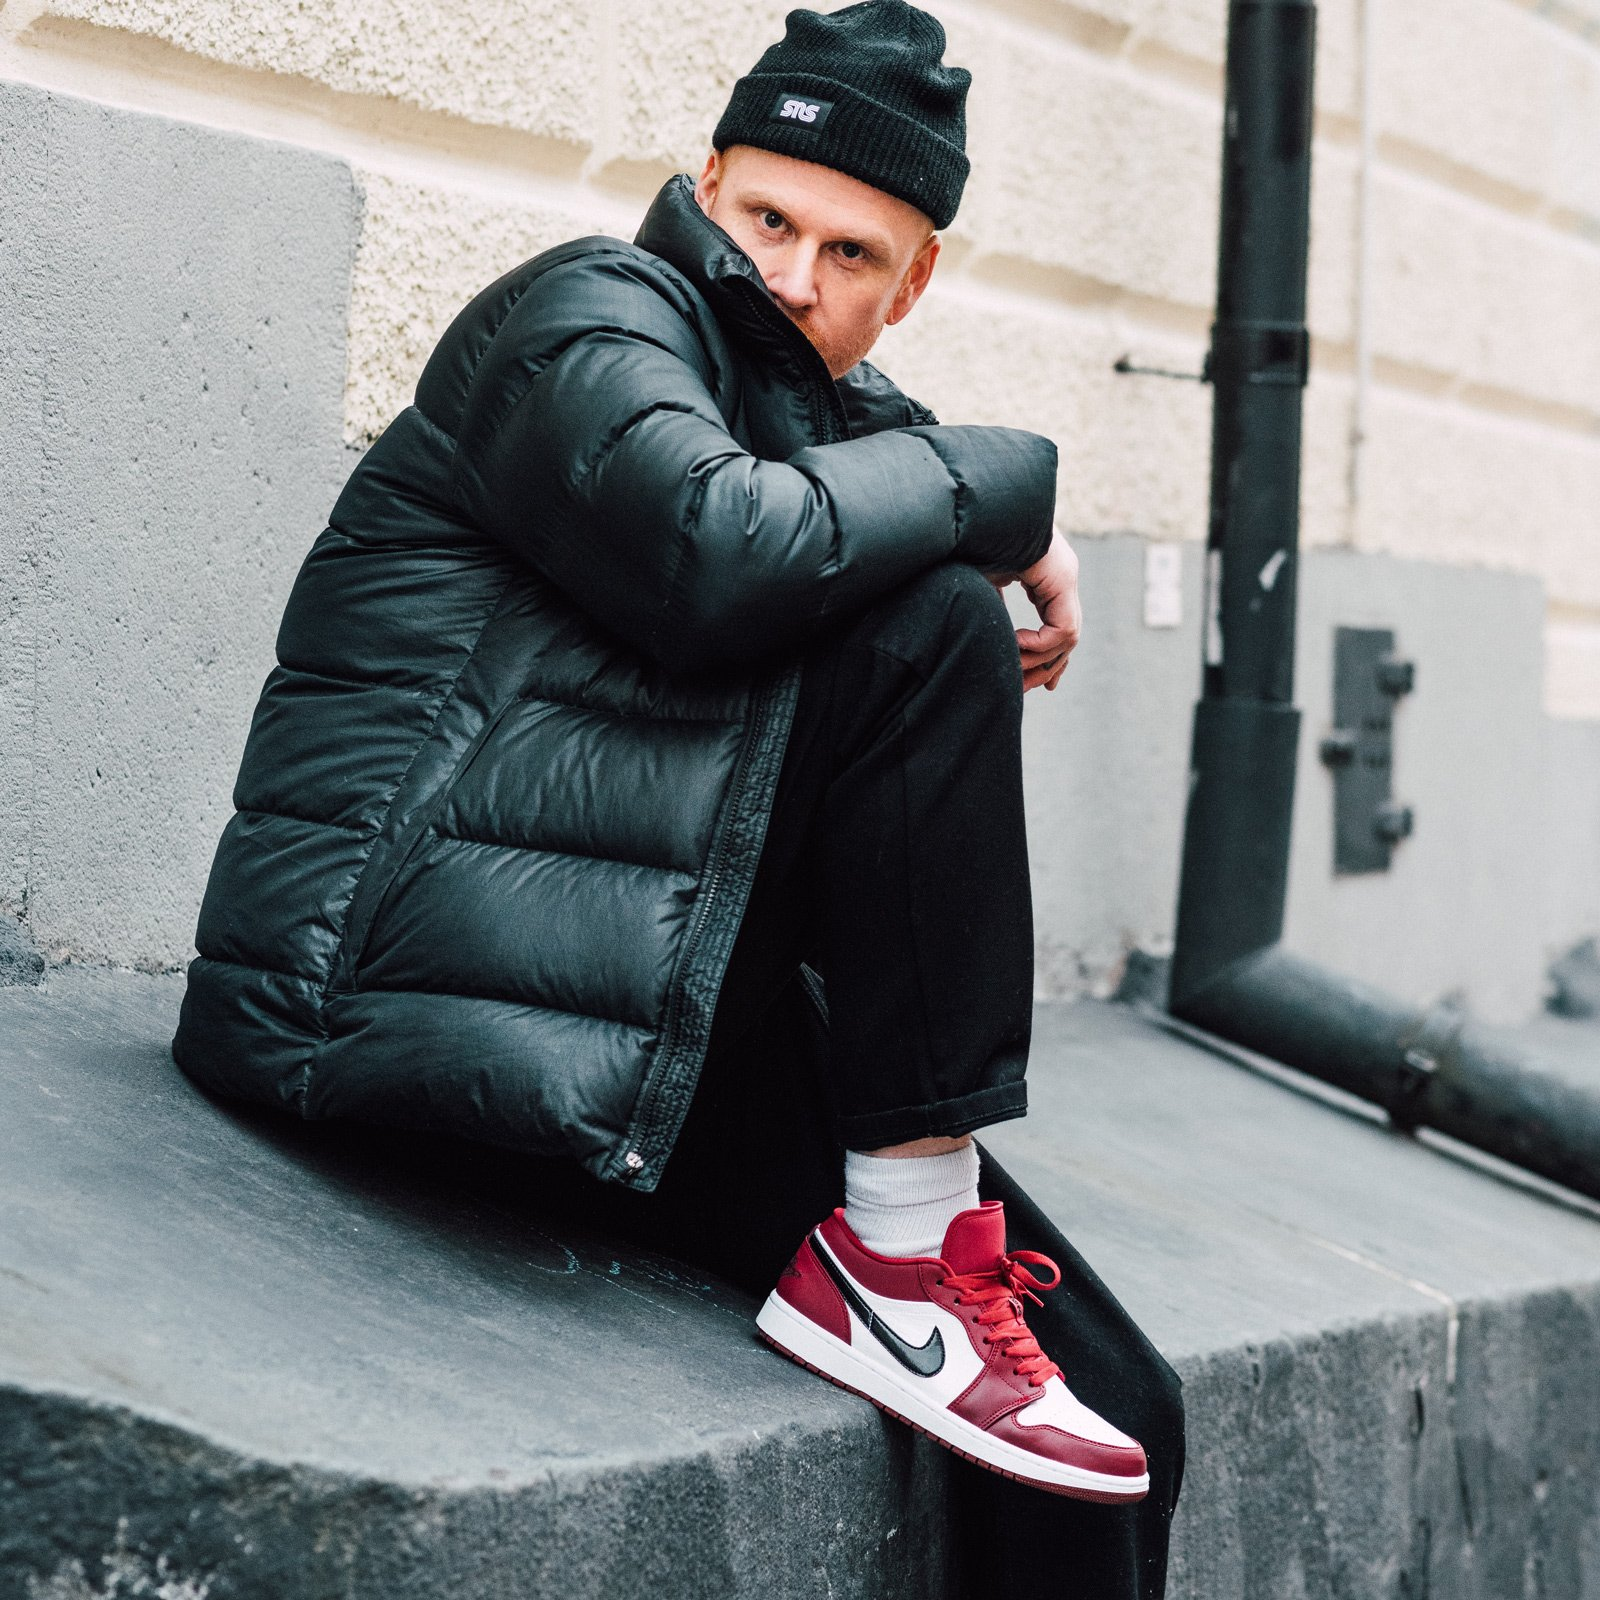 Ao khoac nhe Quan kaki Tat sang mau Bi quyet de ton sneaker